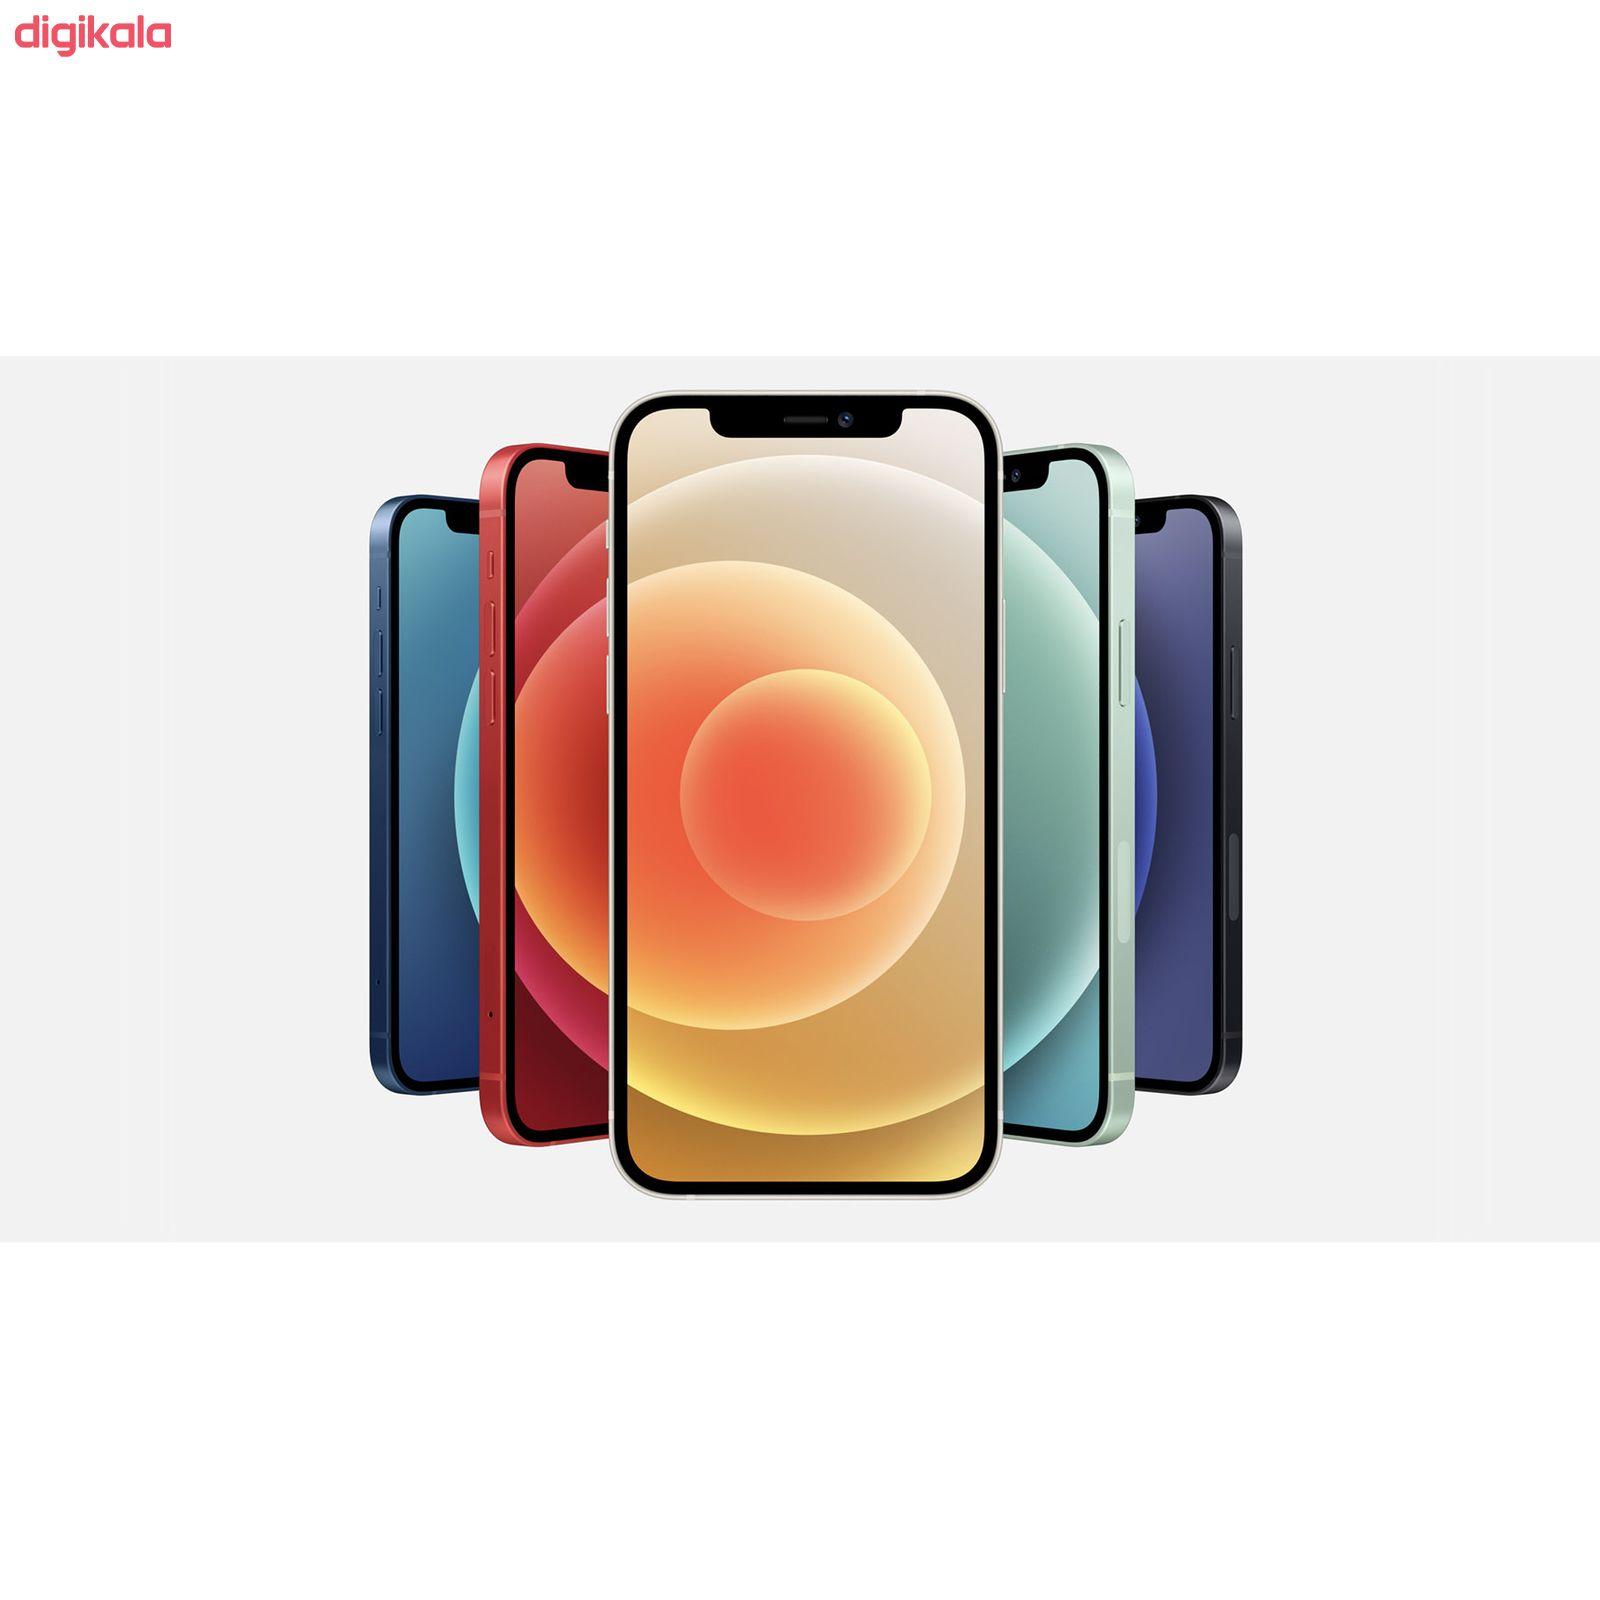 گوشی موبایل اپل مدل iPhone 12 A2404 دو سیم کارت ظرفیت 128 گیگابایت  main 1 16